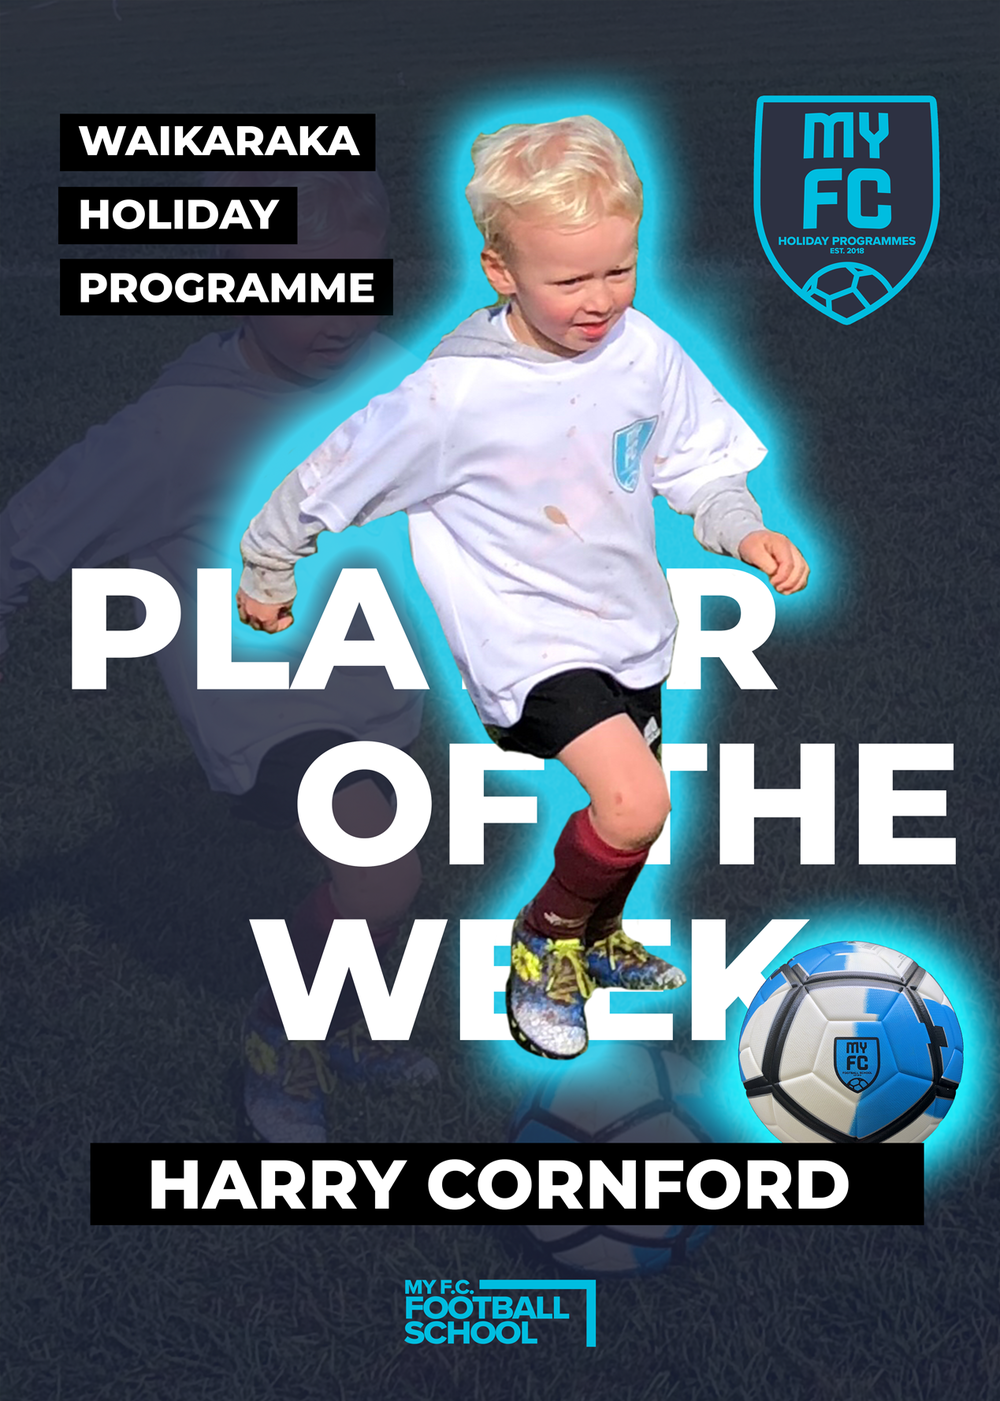 playeroftheweek_waikaraka_harrycornford.png